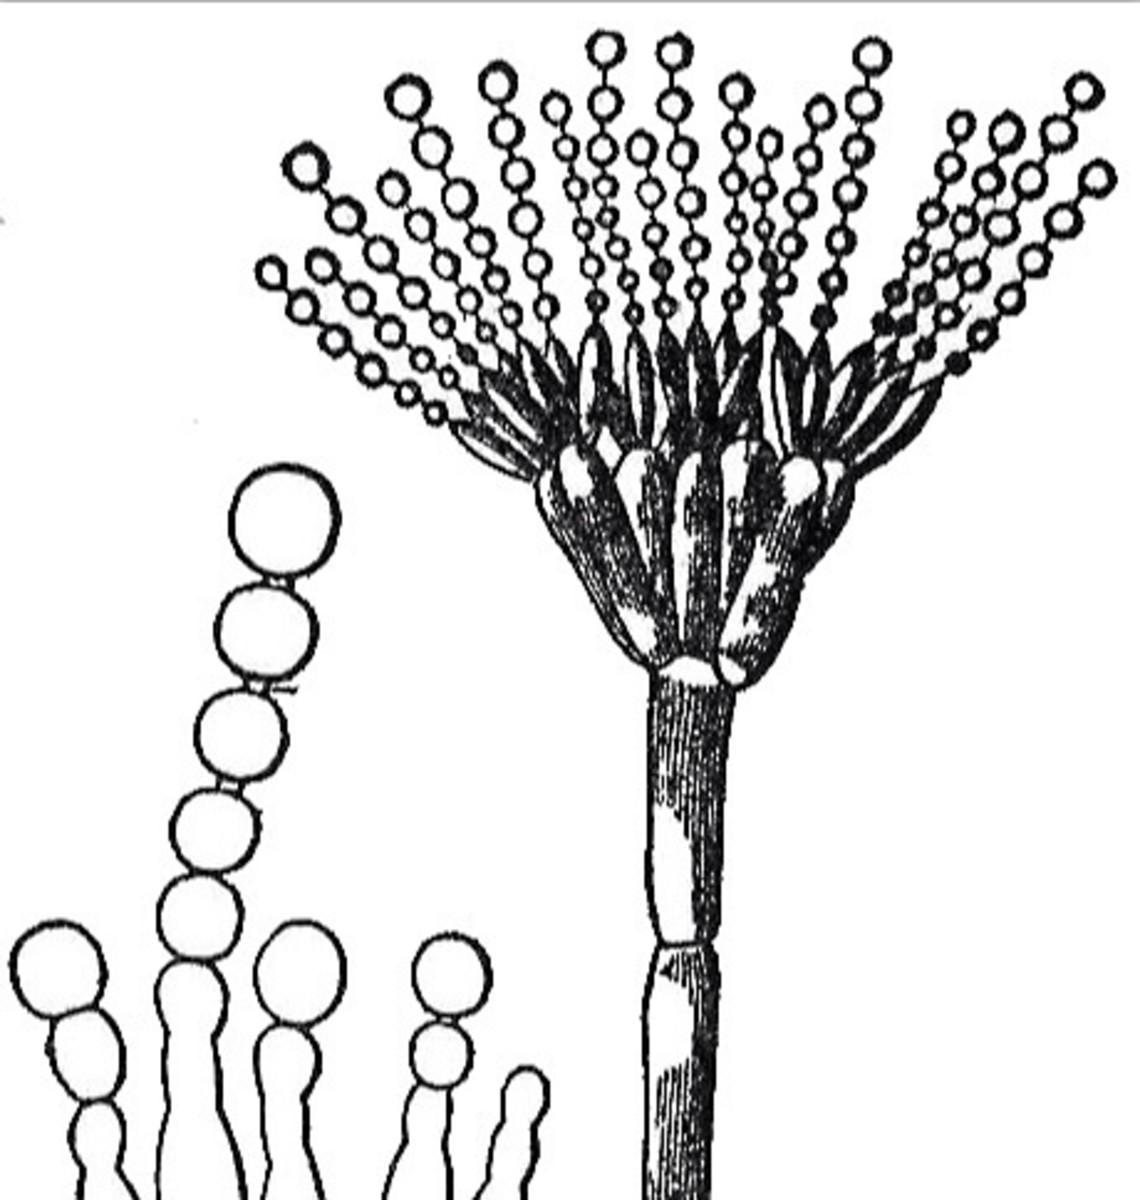 A conidiophore bearing conidia